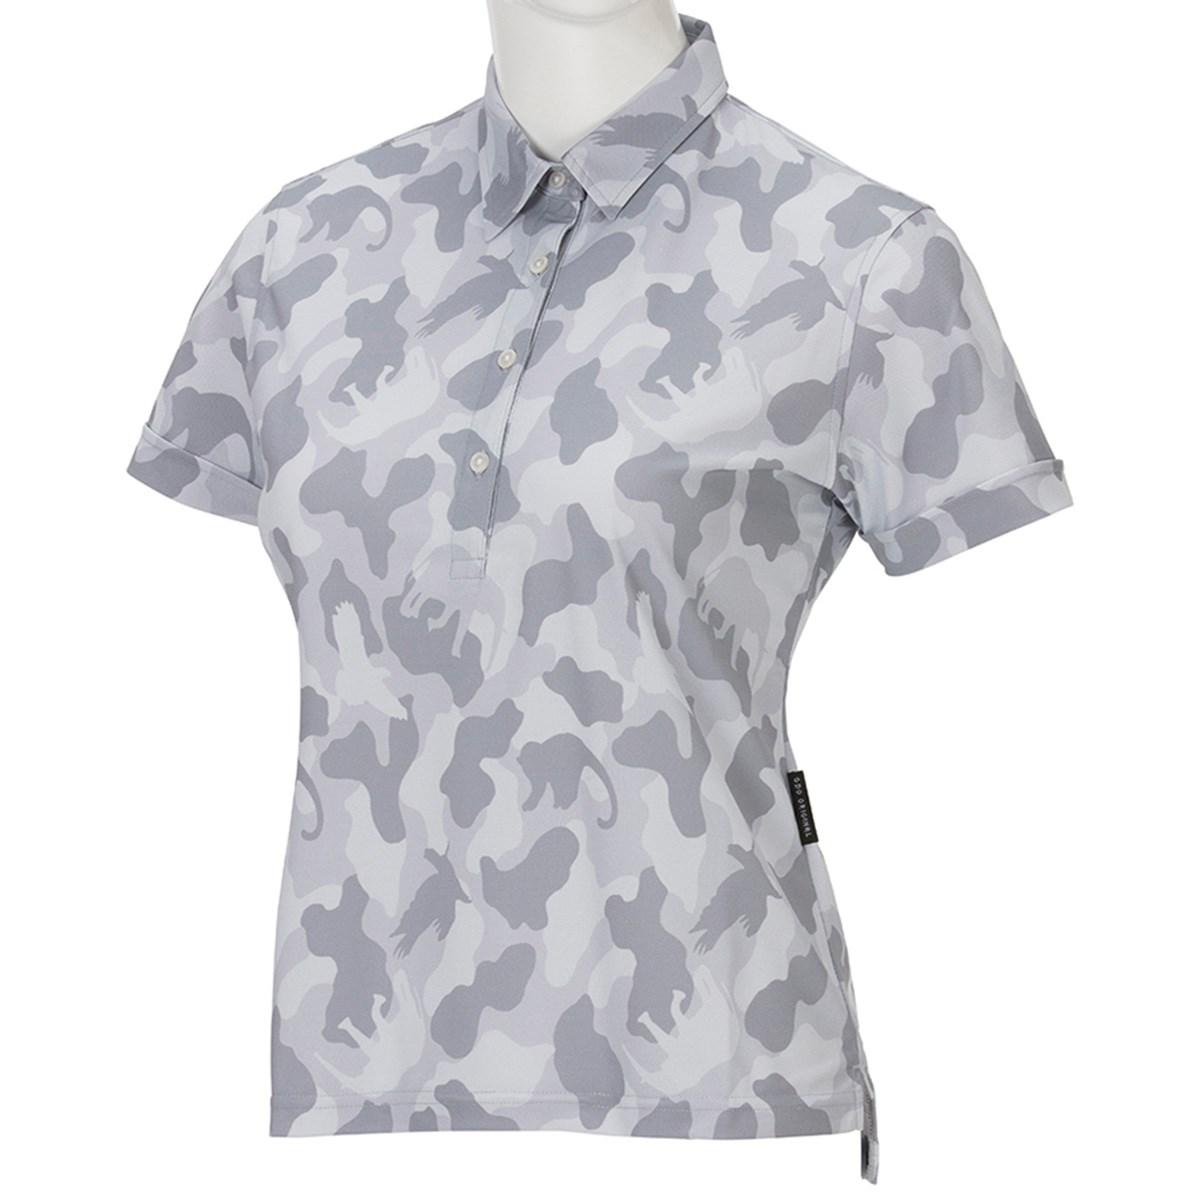 GDO オリジナル GDO ORIGINAL UVカット半袖ゴルフポロシャツ M カモ レディス